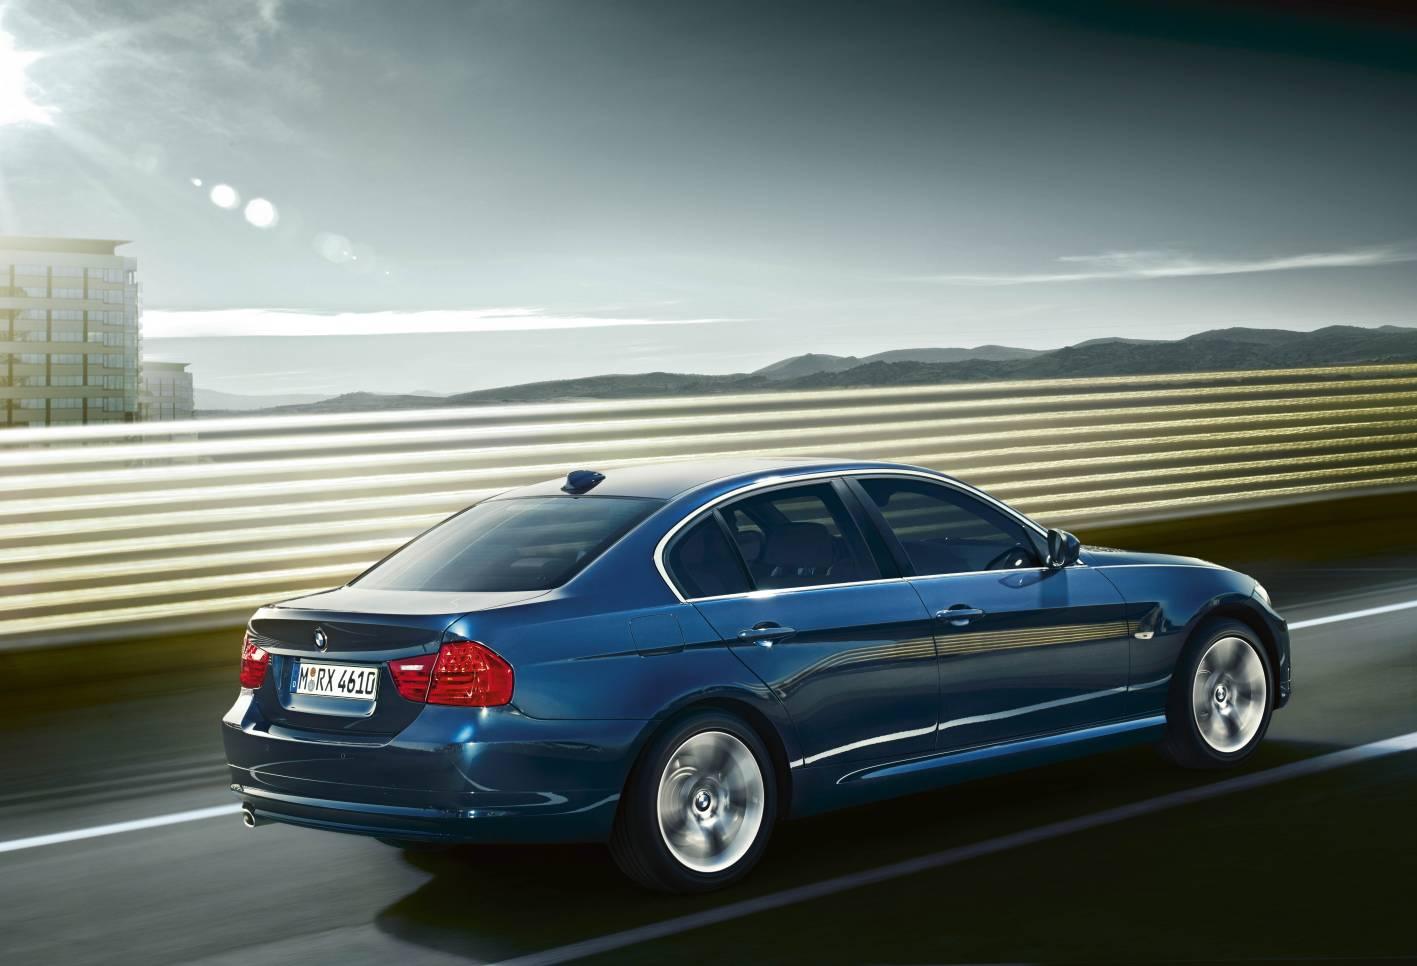 Used 2014 jaguar xj for sale pricing features edmunds 2017 2018 best cars reviews